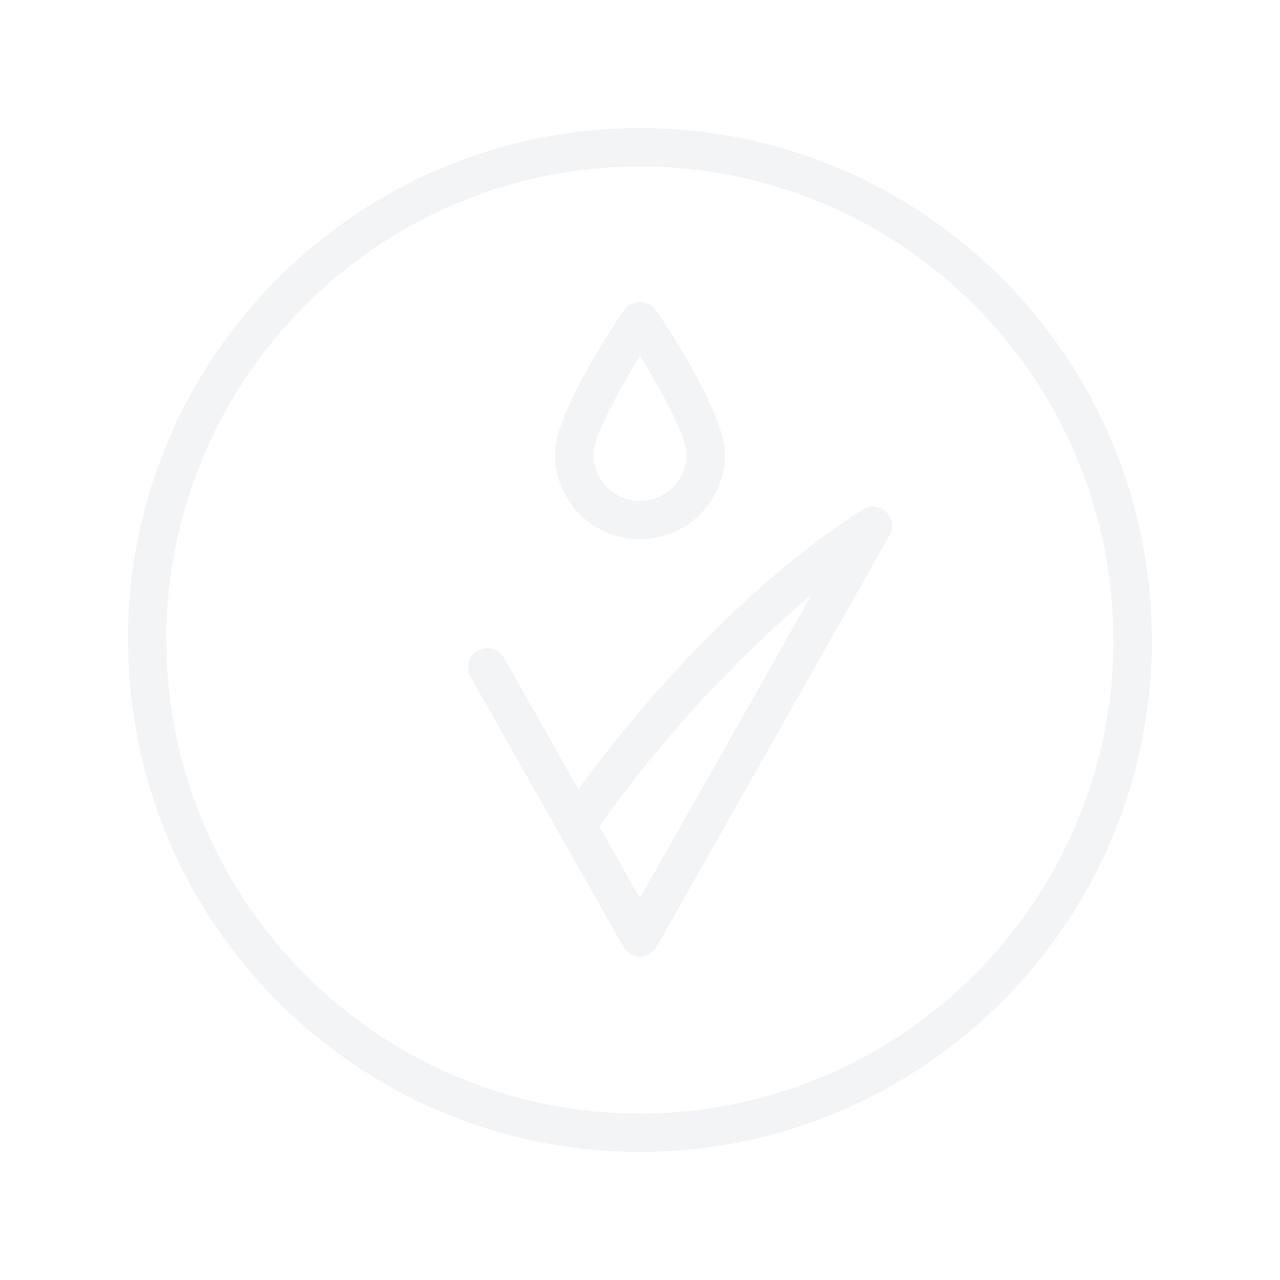 Natura Siberica Volumizing And Balancing Shampoo 400ml